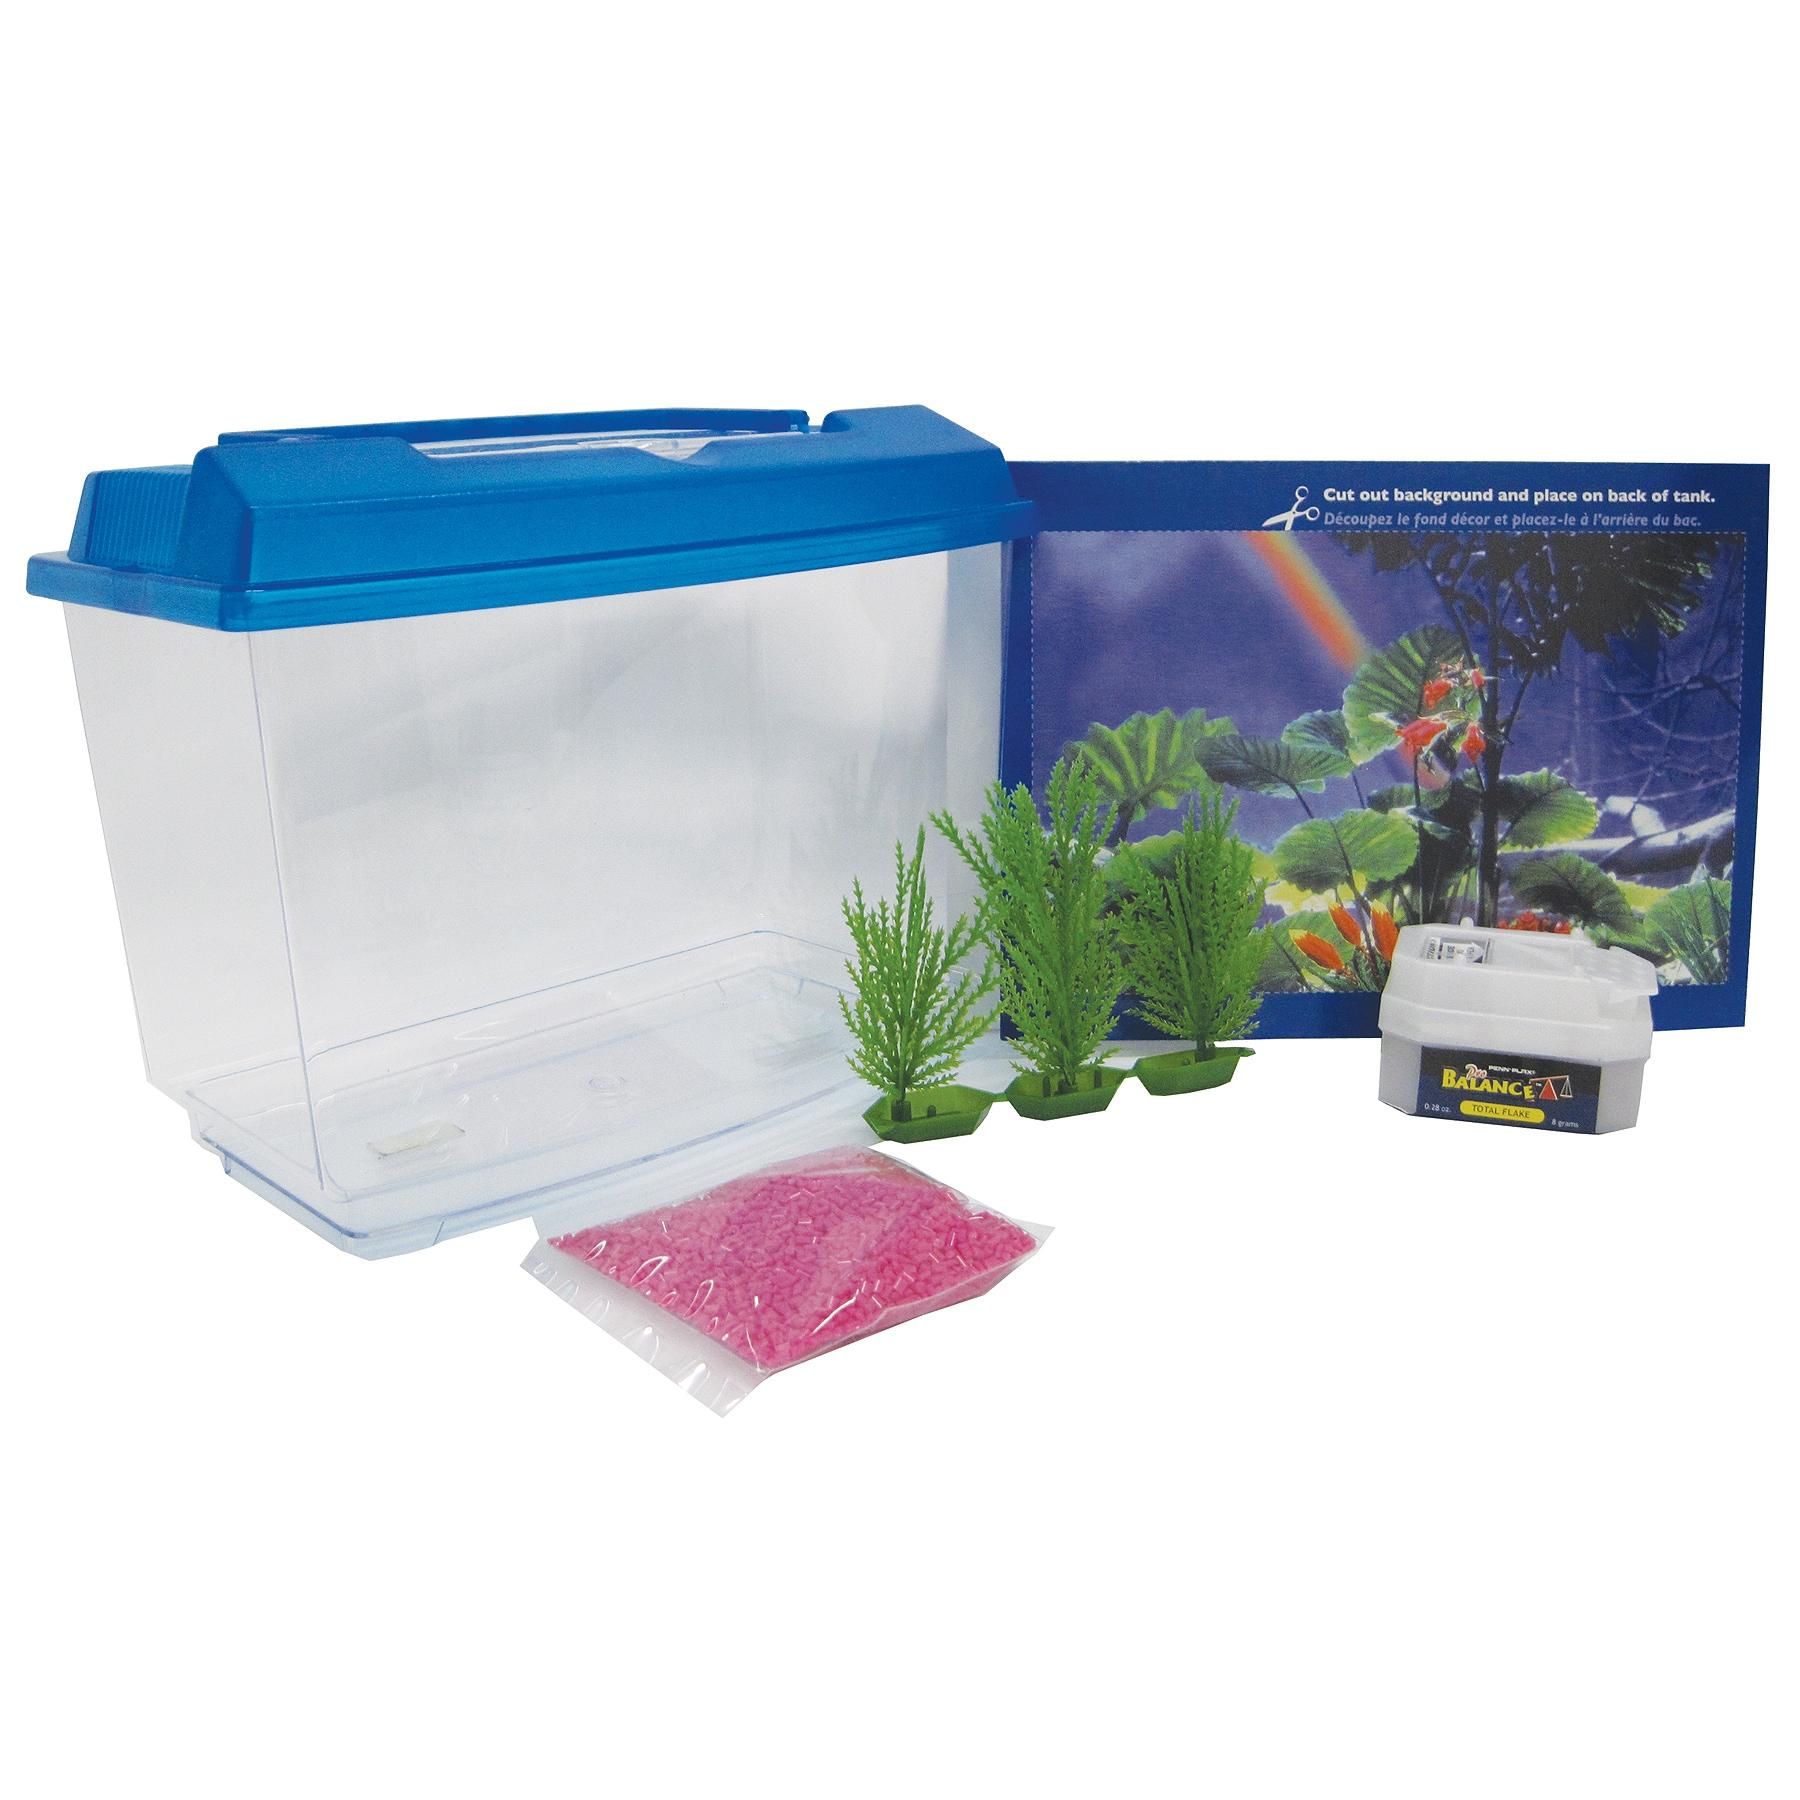 Penn Plax 1 Gallon Goldfish & Betta Aquarium Kit (Goldfis...